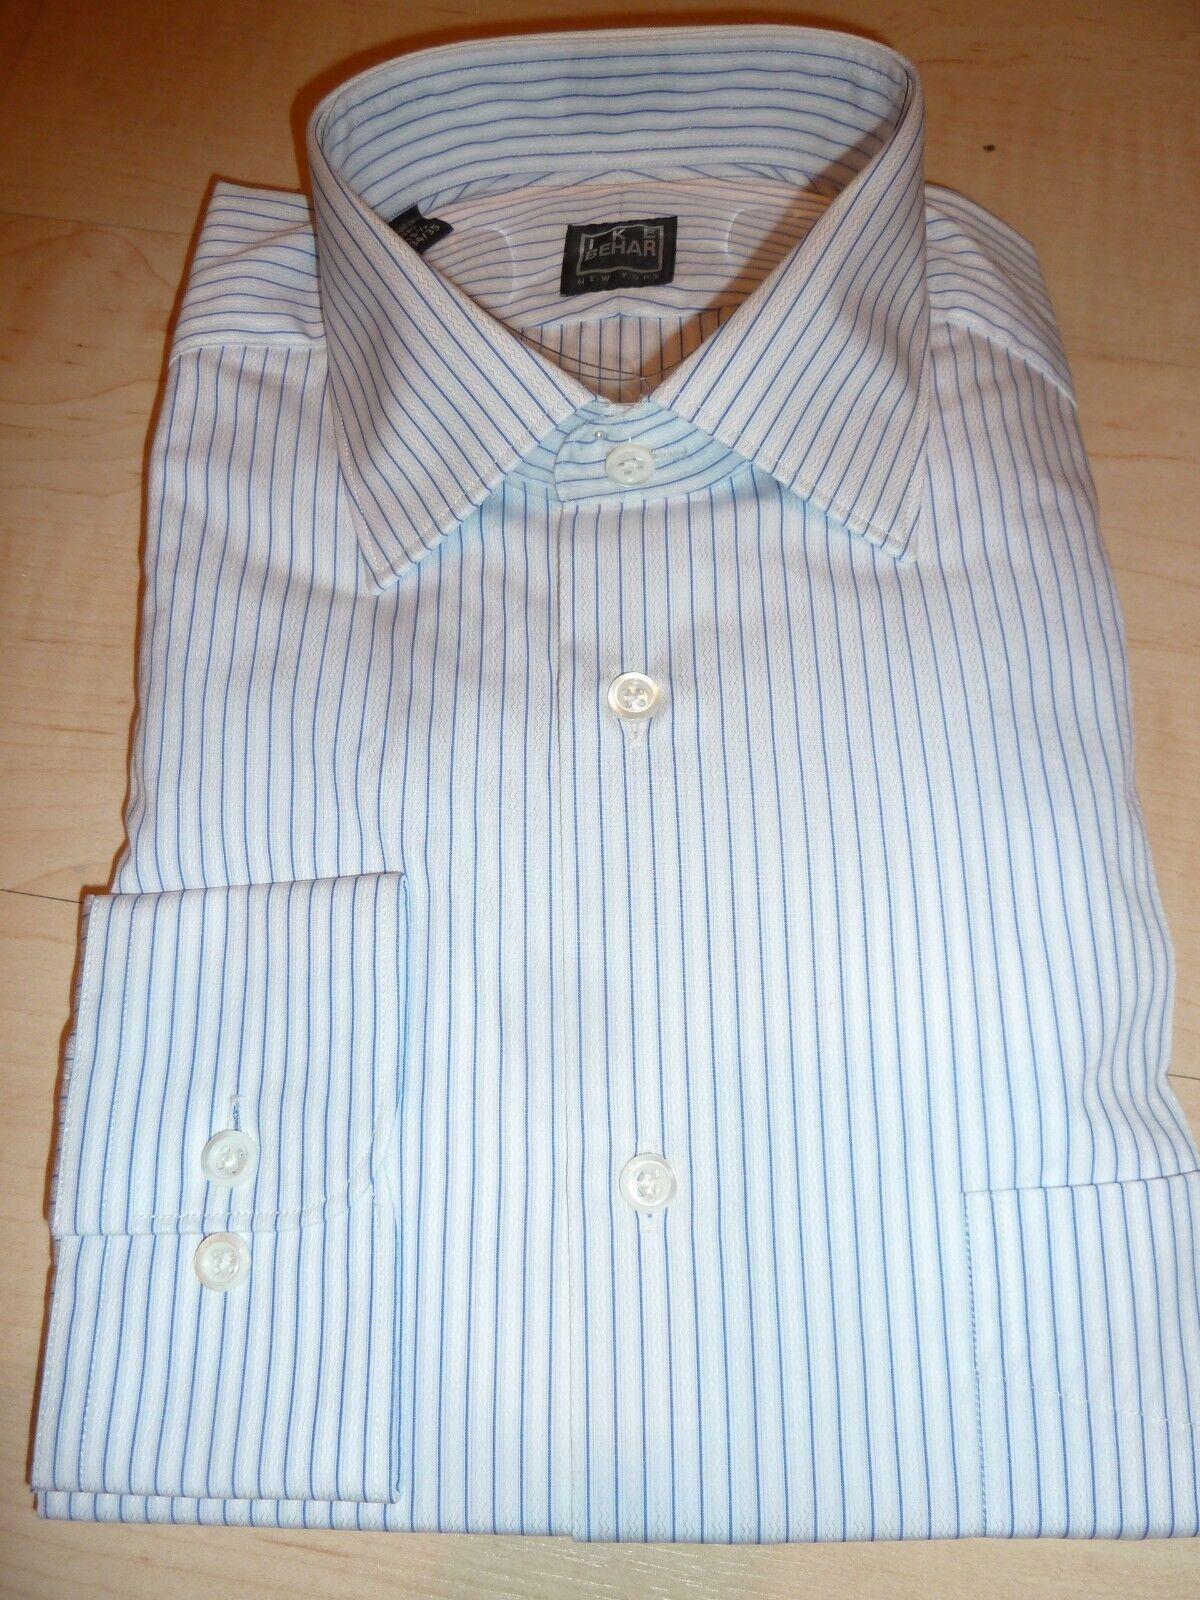 NEW  IKE BEHAR MENS SHIRT Sz 15.5 34 35 Luxury Cotton white stripe BC 3